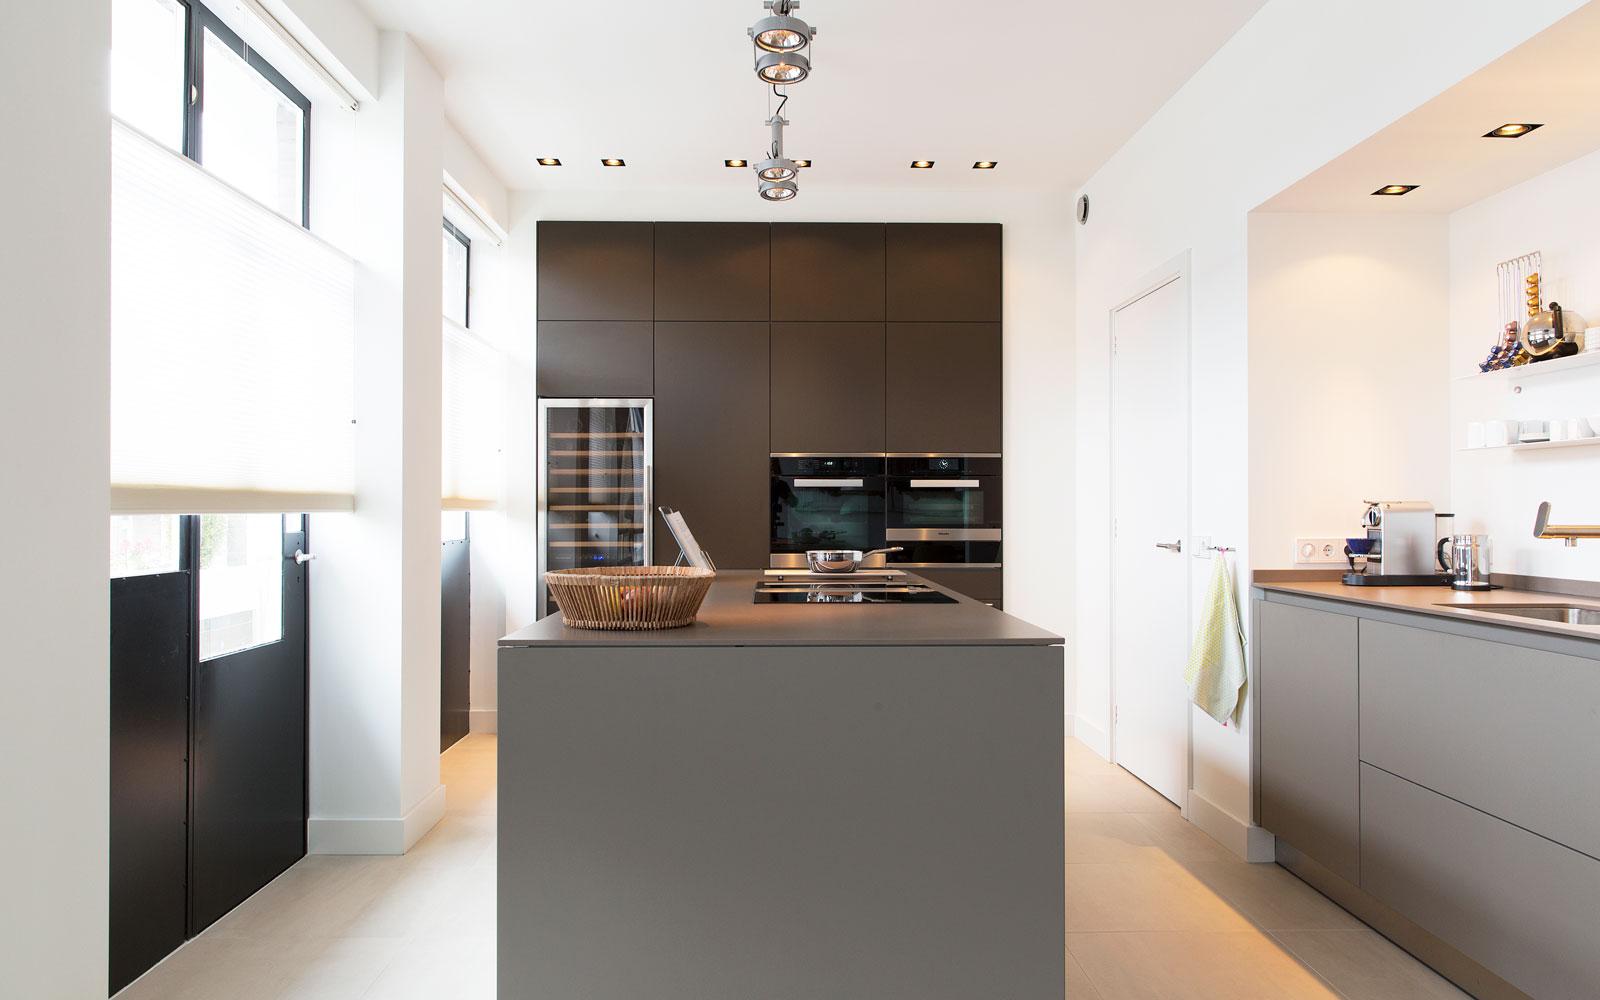 Keuken, kookeiland, donkere tinten, wijnkoelkast, open keuken, stadsappartement, BNLA architecten